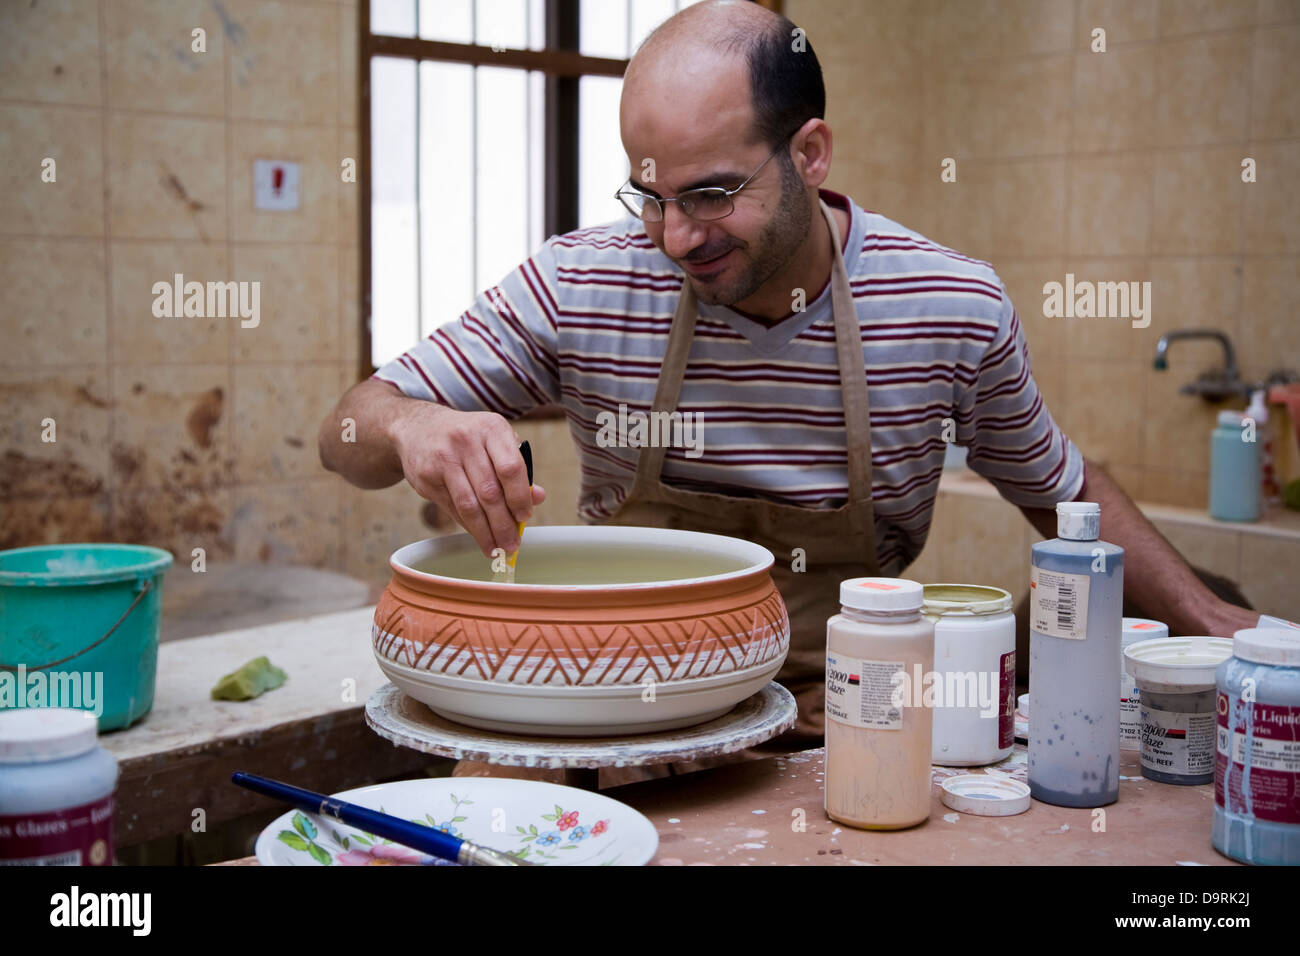 Potter à l'Al-Jasara Centre d'Artisanat, Manama, Bahreïn Photo Stock